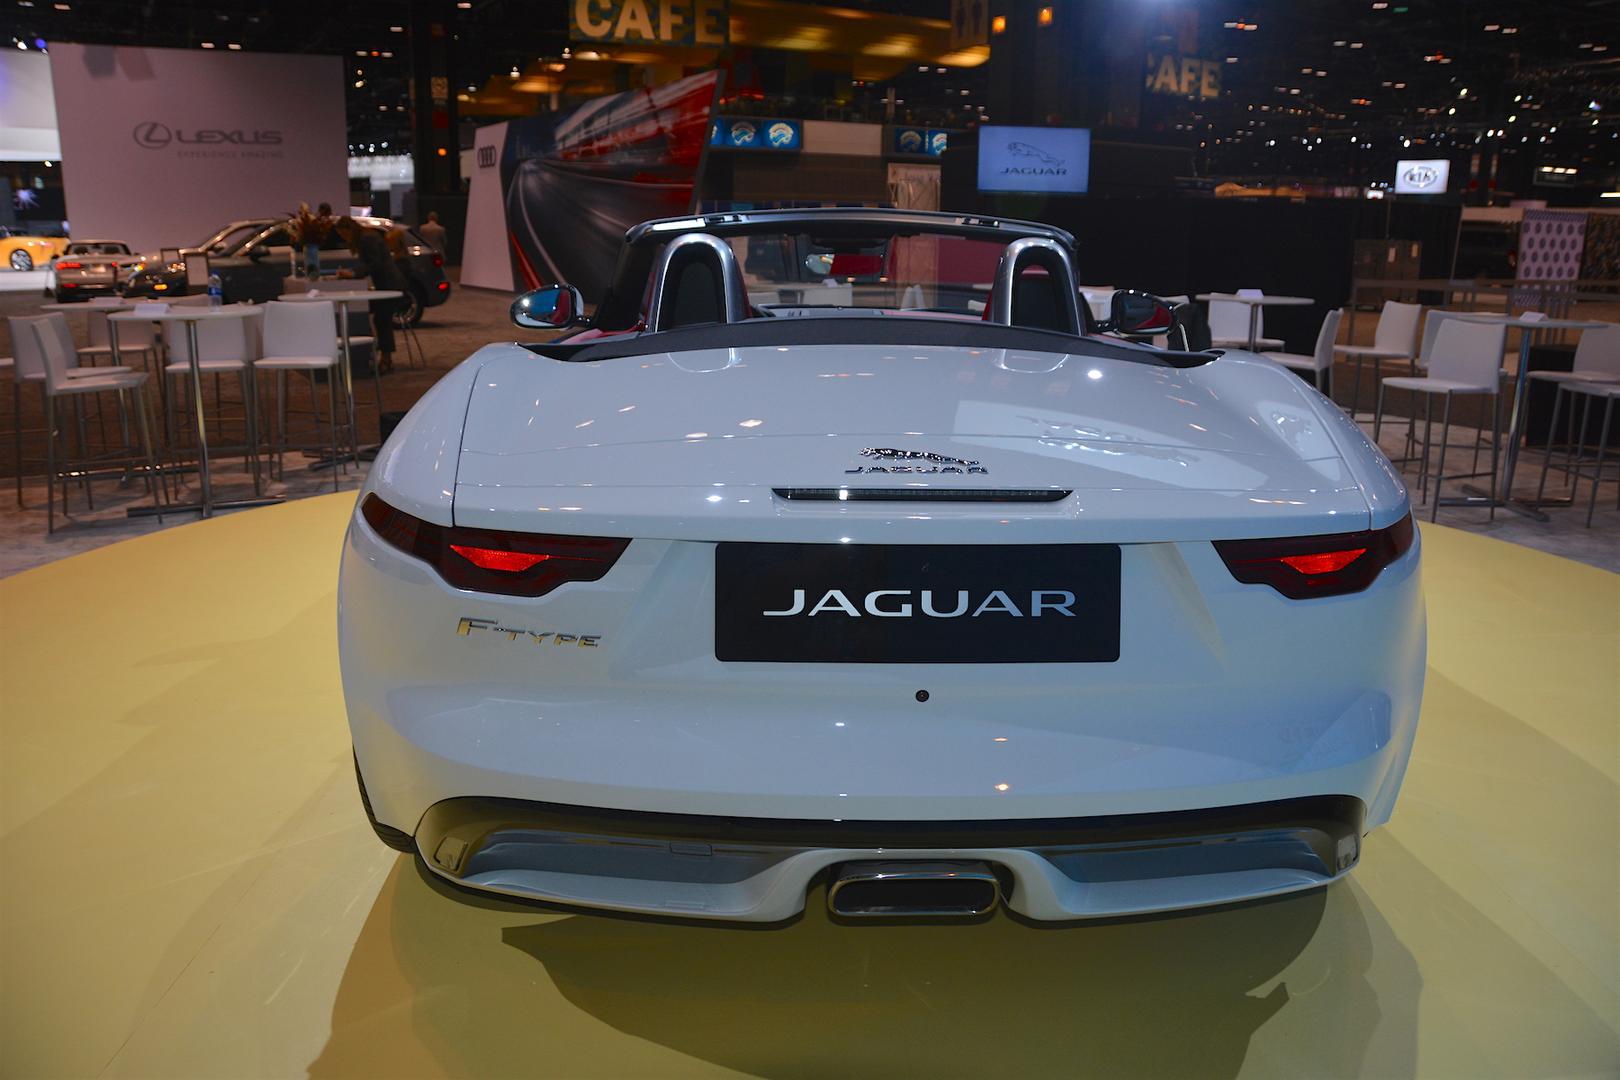 2020 Jaguar F-Type Convertible Rear